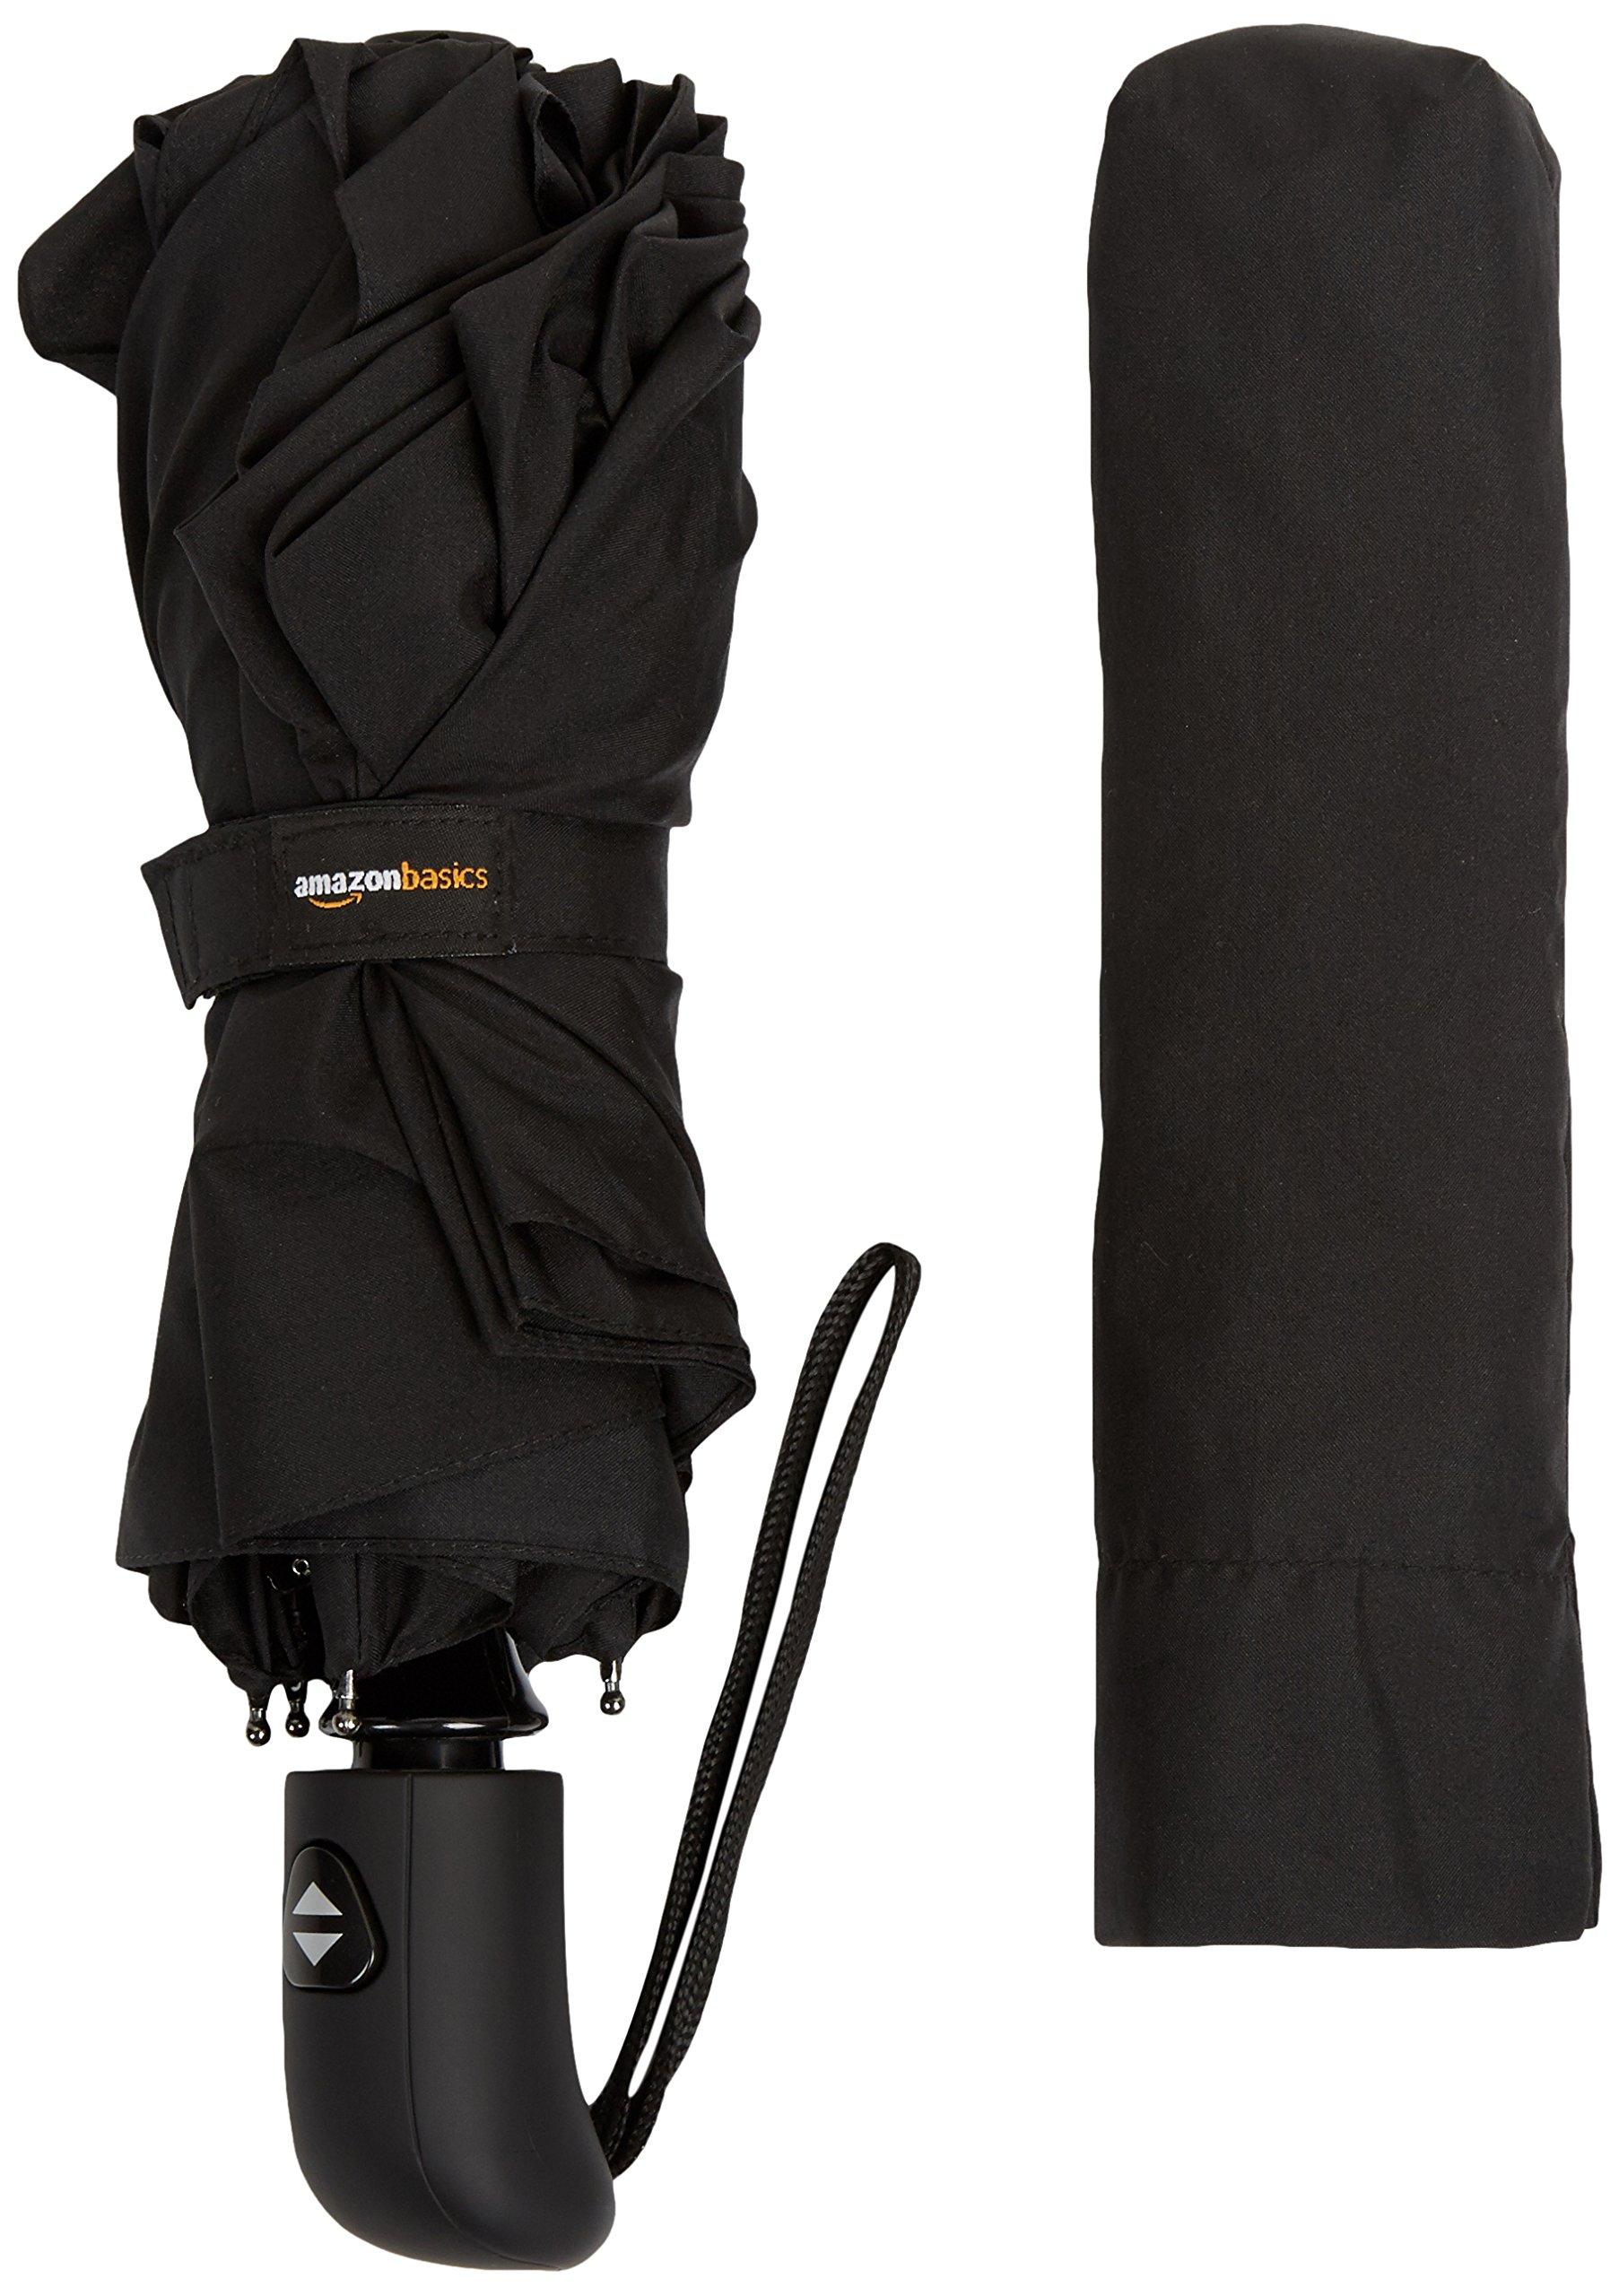 AmazonBasics Umbrella with Wind Vent, Light Blue 6